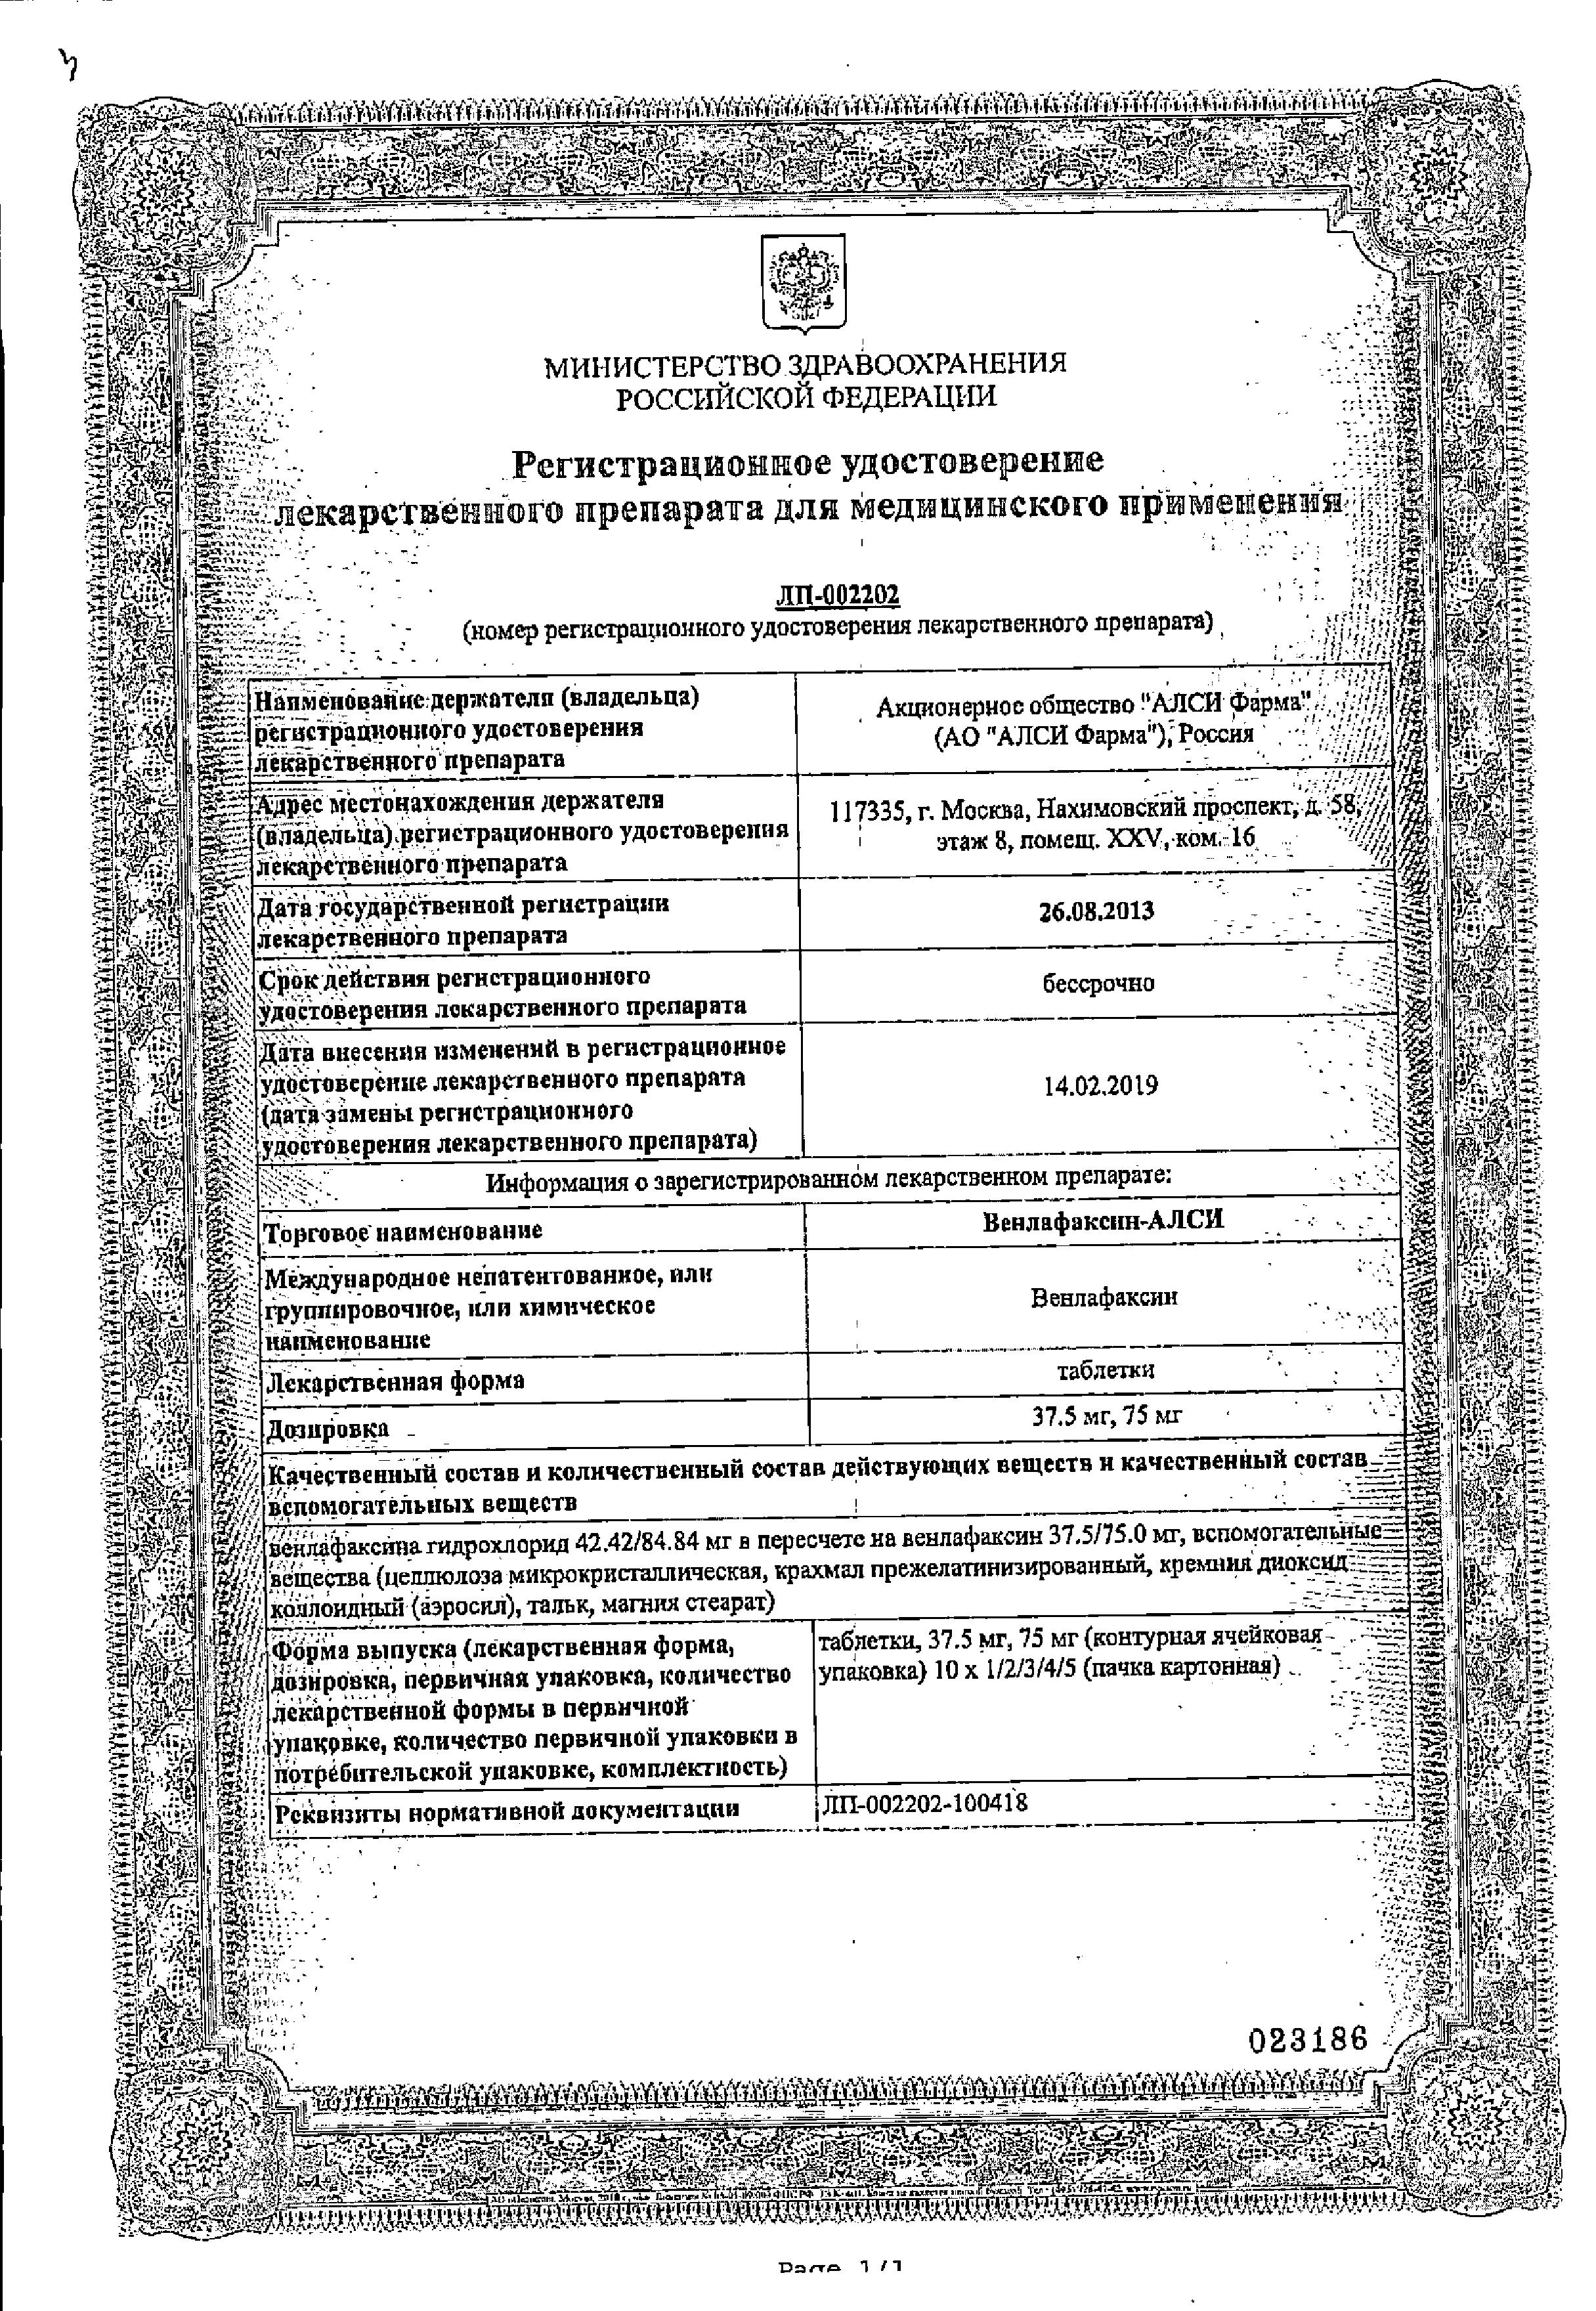 Венлафаксин сертификат